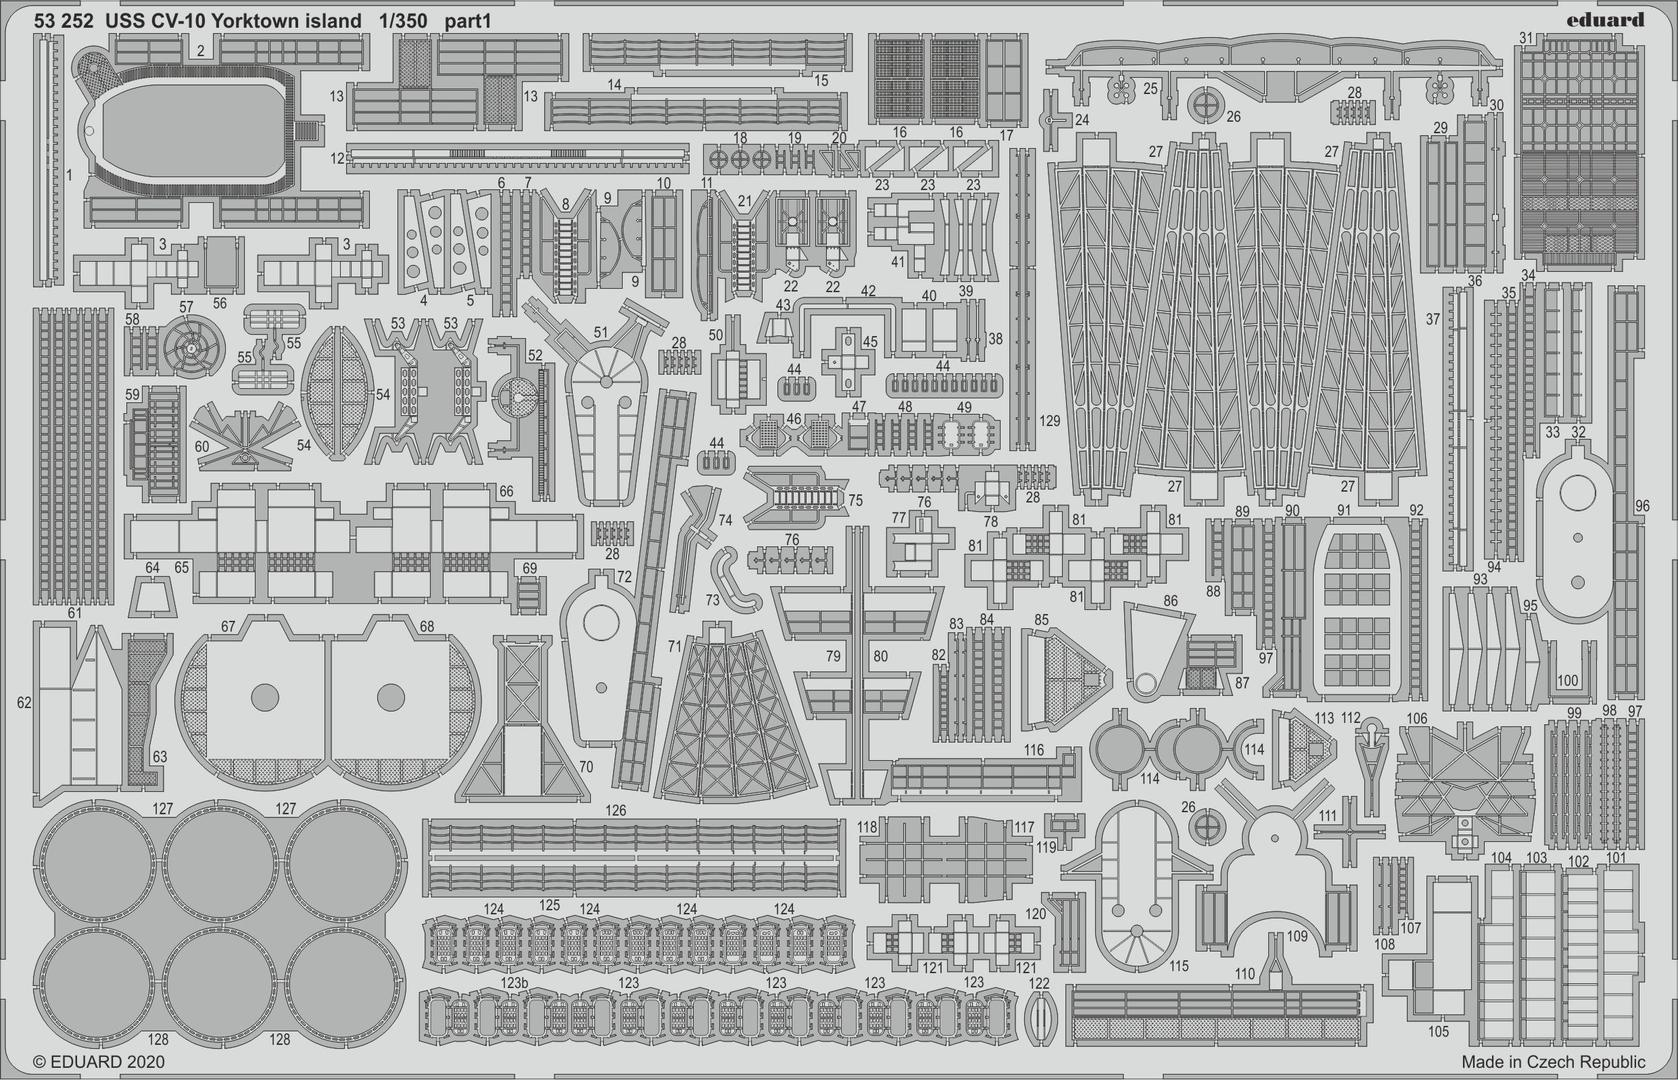 ED53252